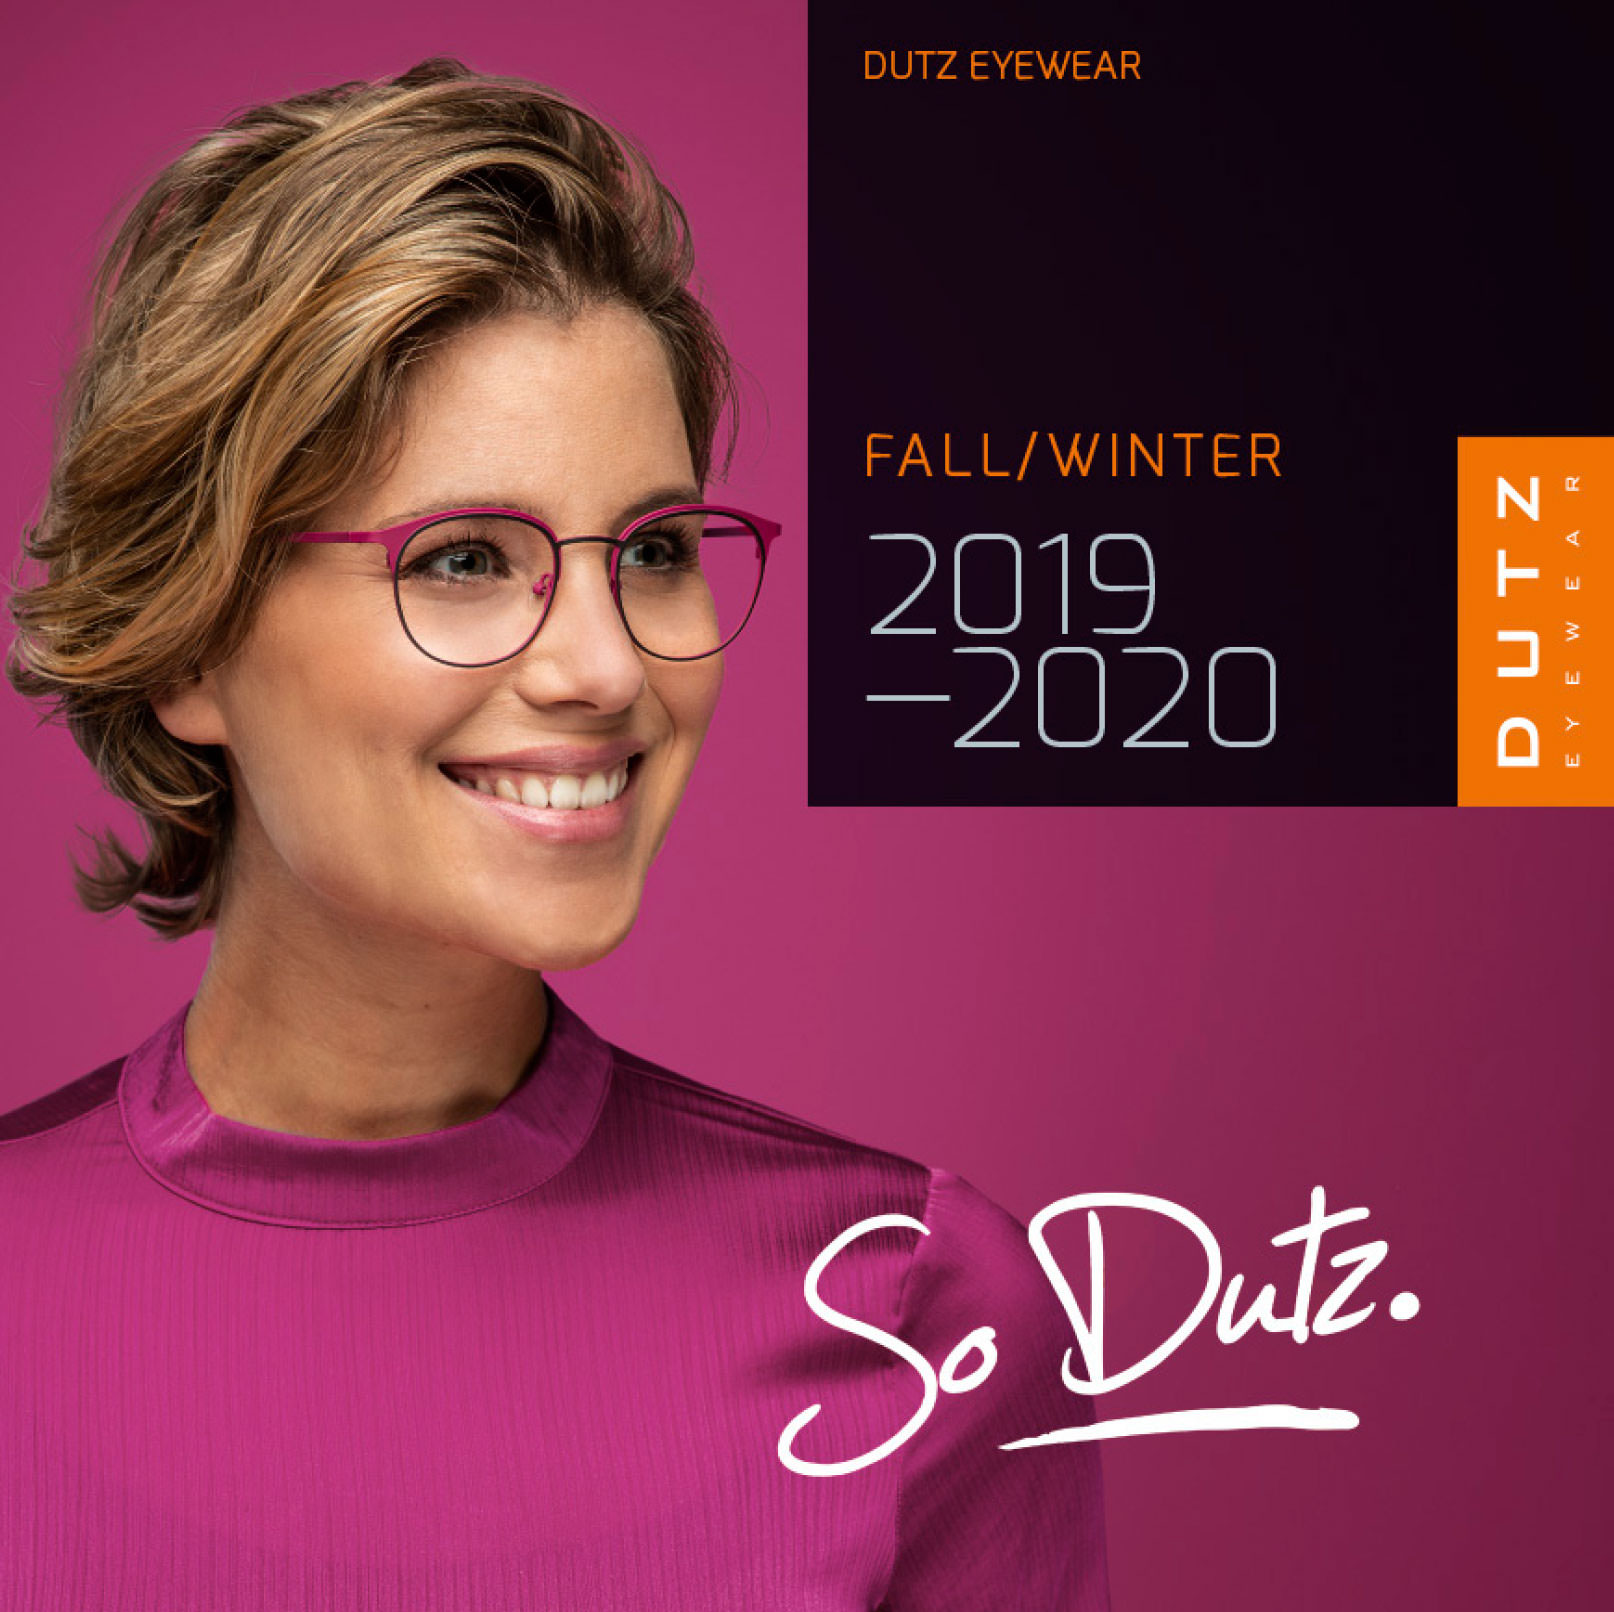 Press Release Fall/Winter 2019-2020